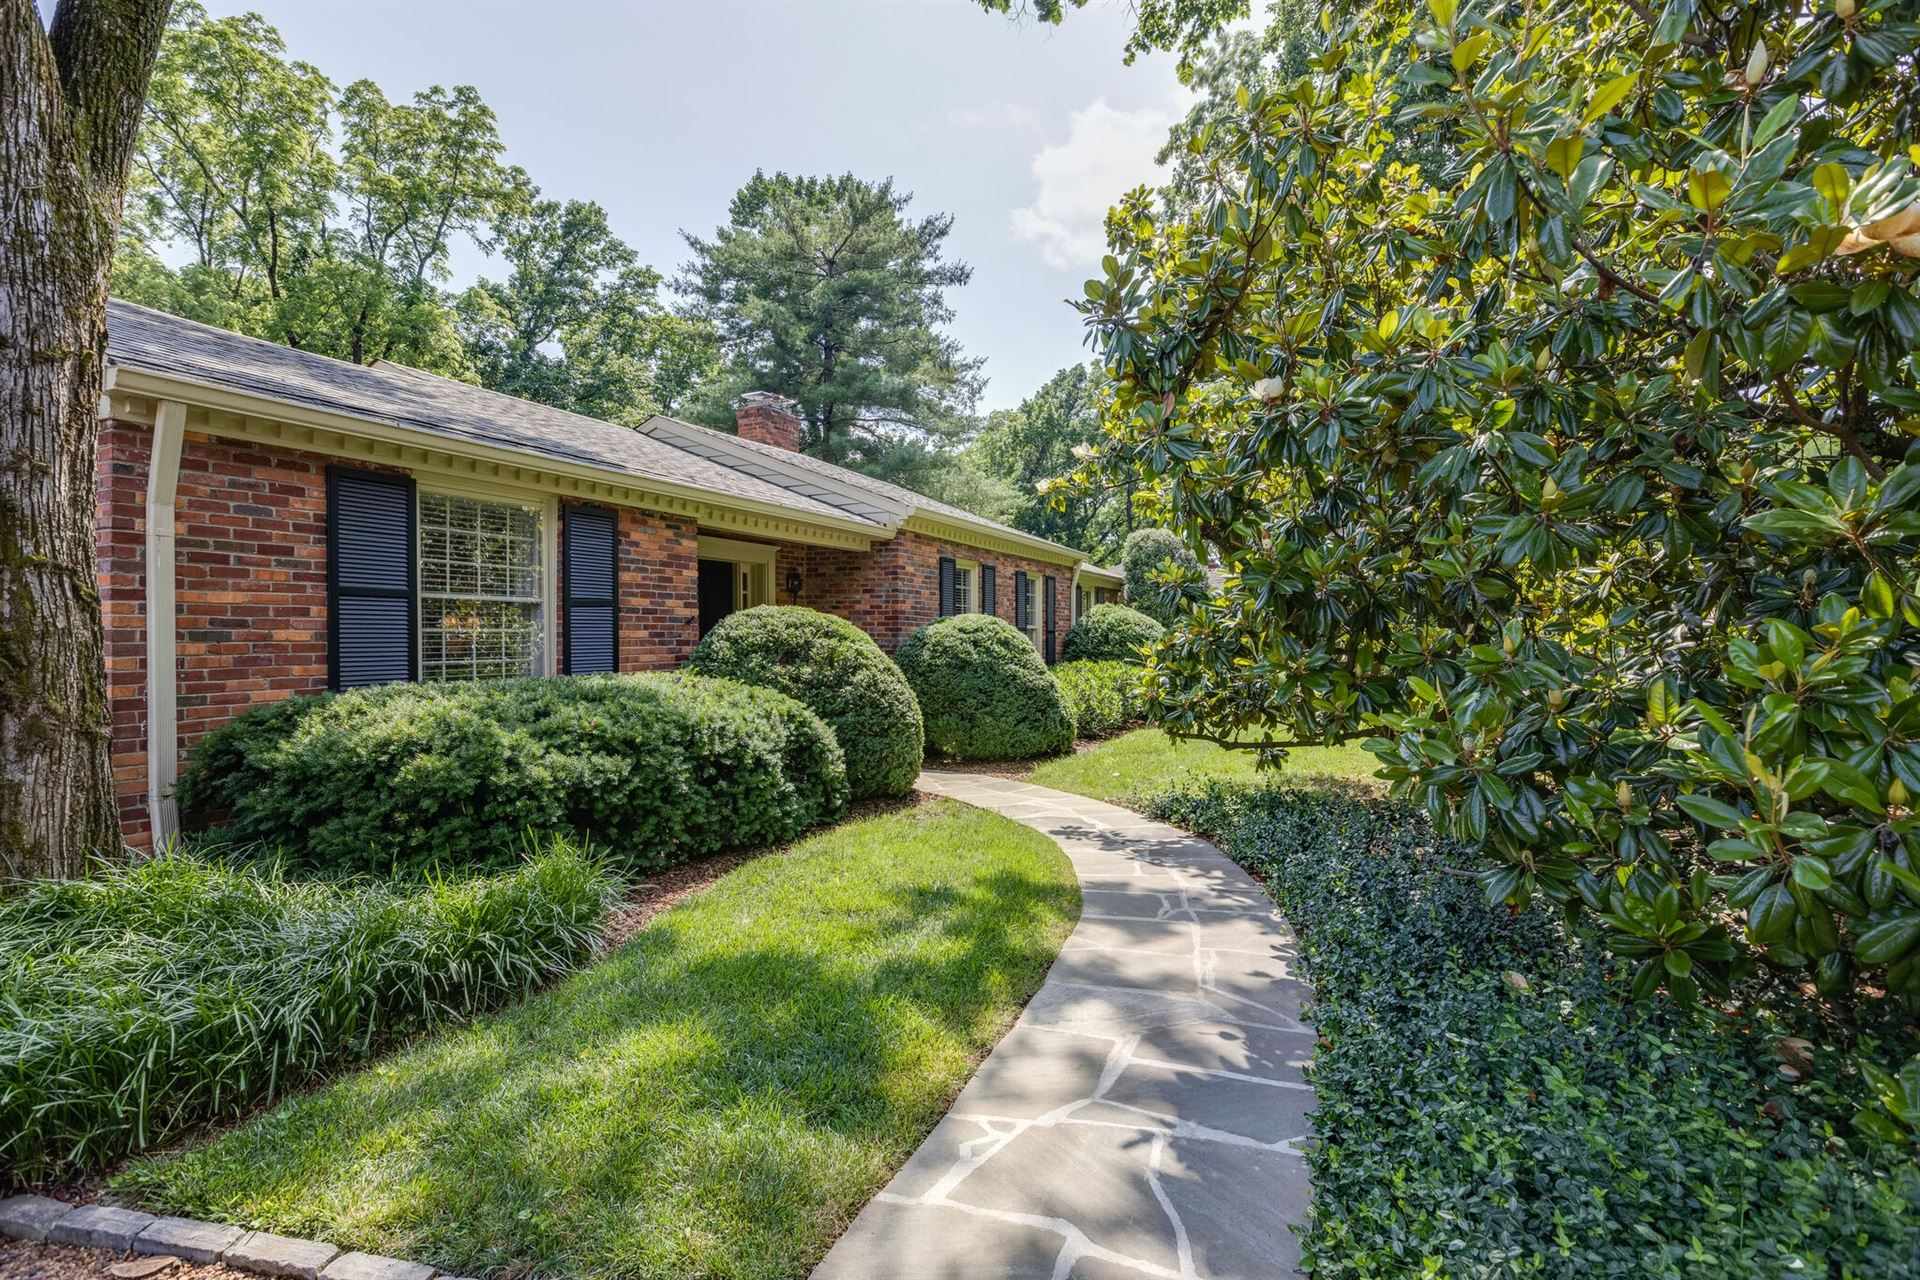 Photo of 3805 Trimble Rd, Nashville, TN 37215 (MLS # 2263107)